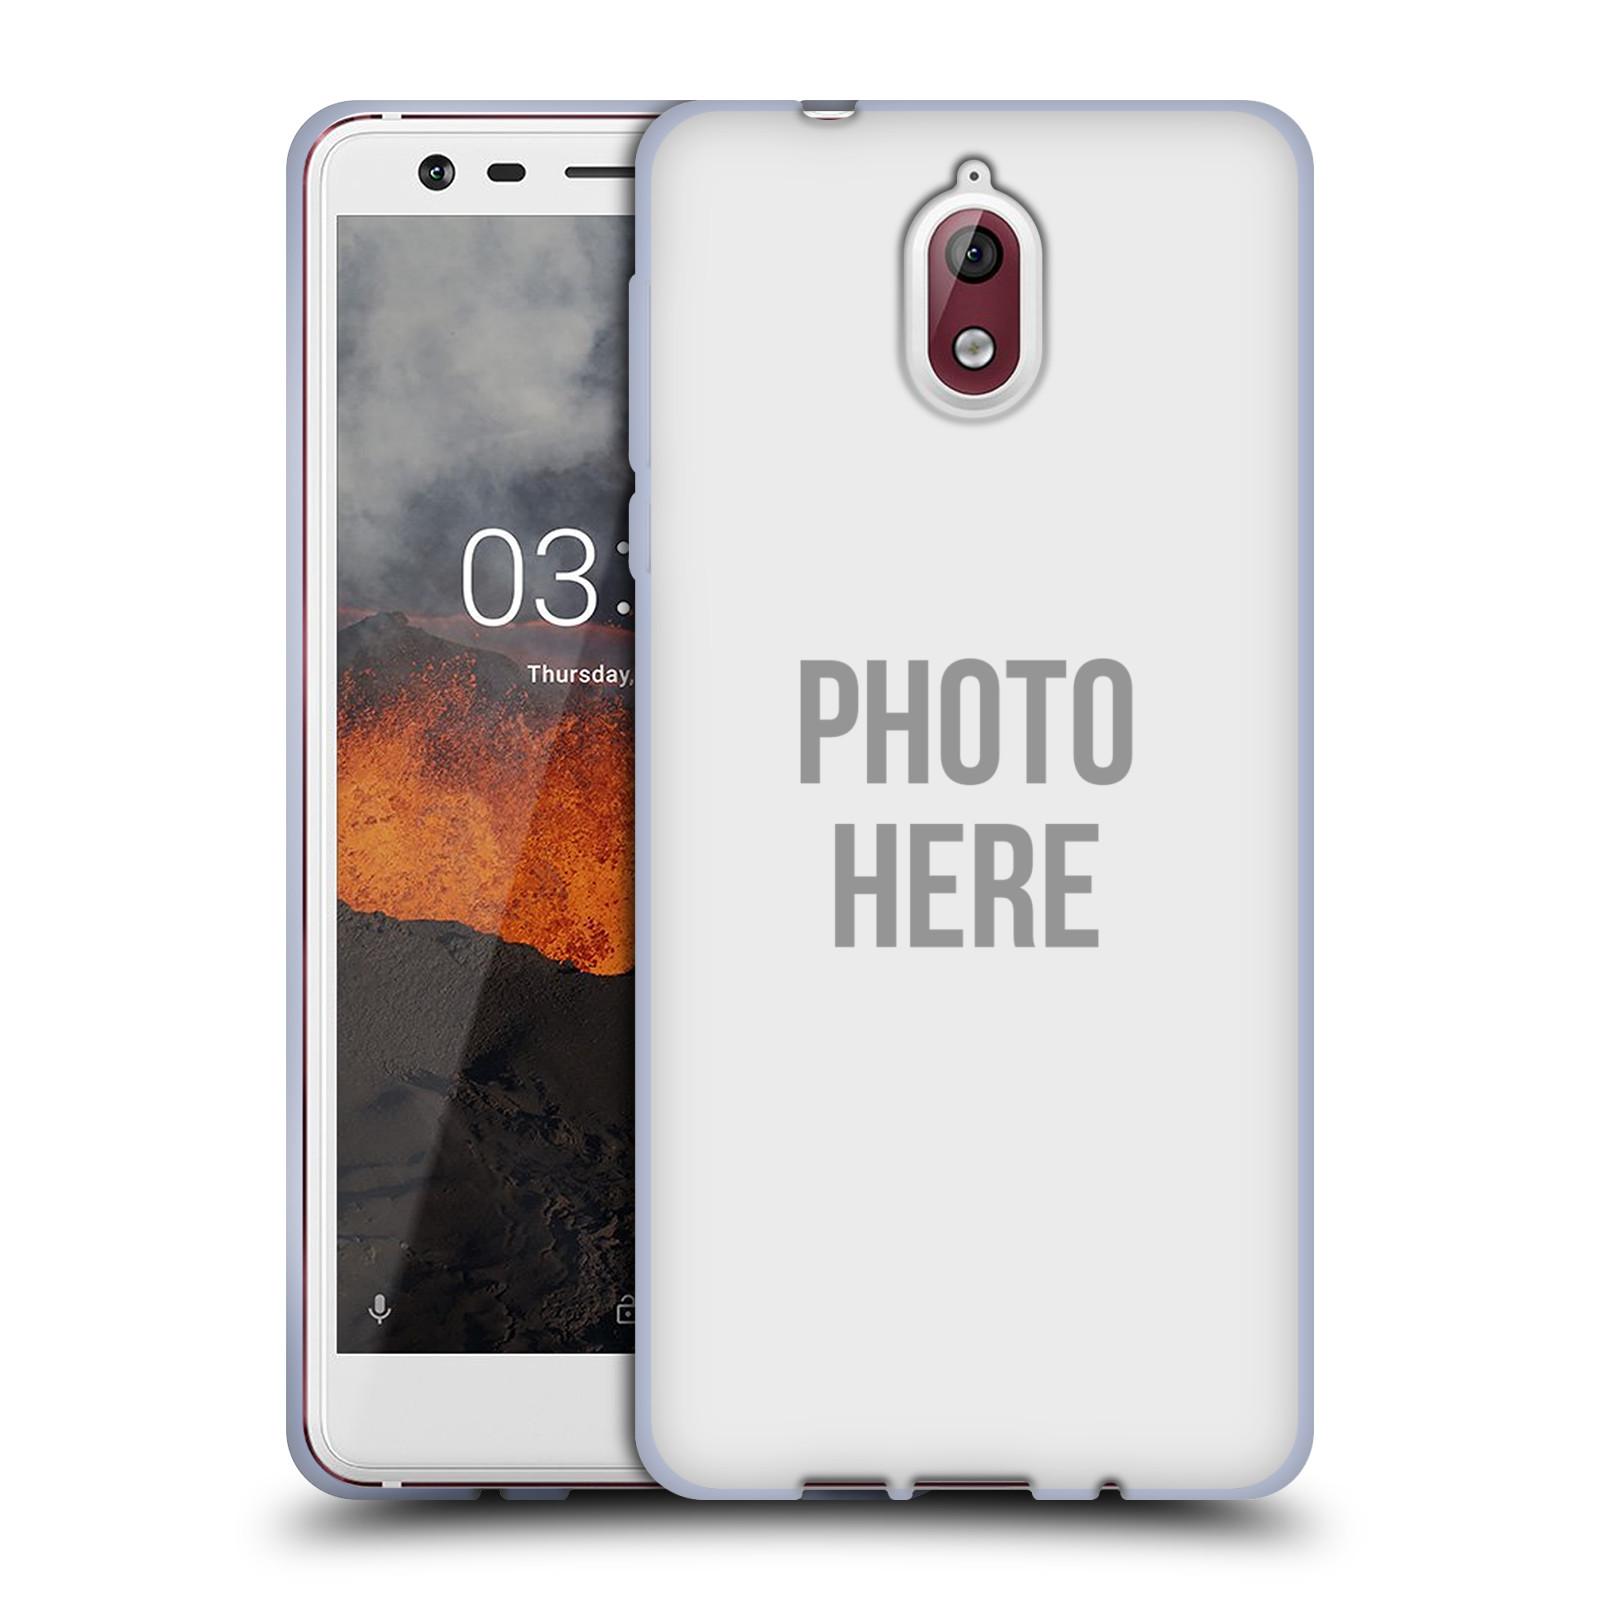 Silikonové pouzdro na mobil Nokia 3.1 - Head Case - s vlastním motivem